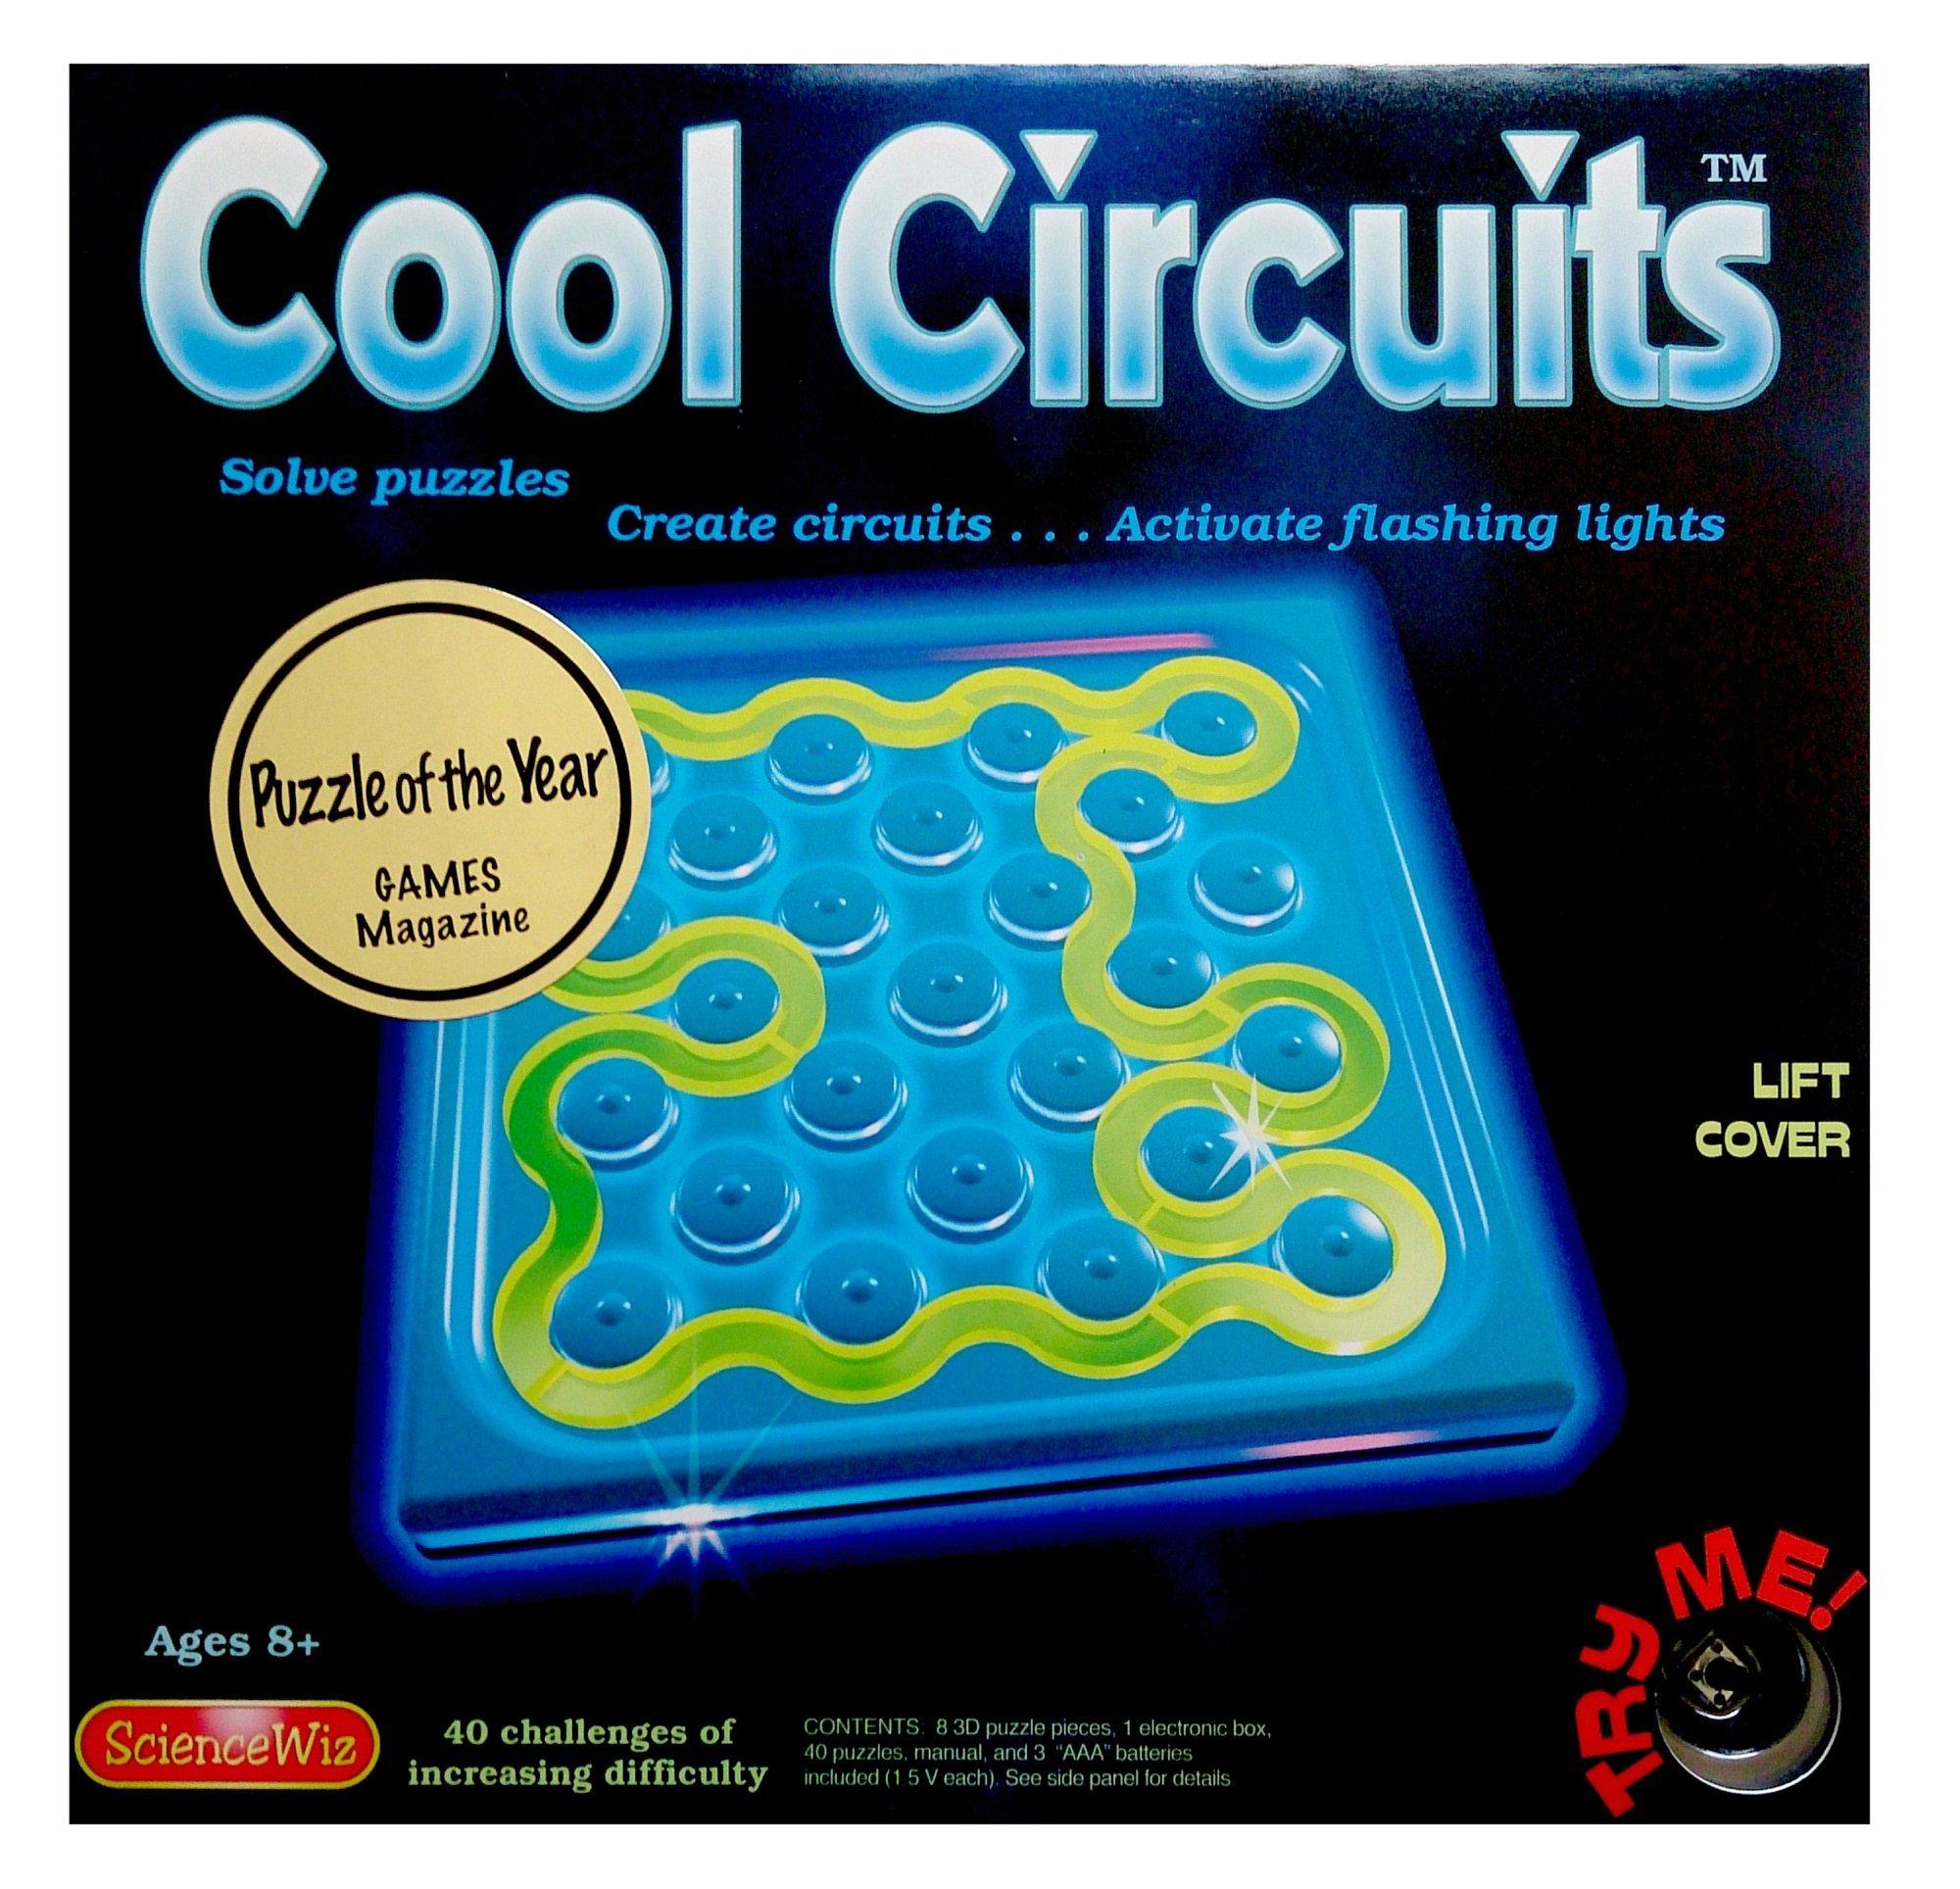 ScienceWiz - Cool Circuits Puzzle Game